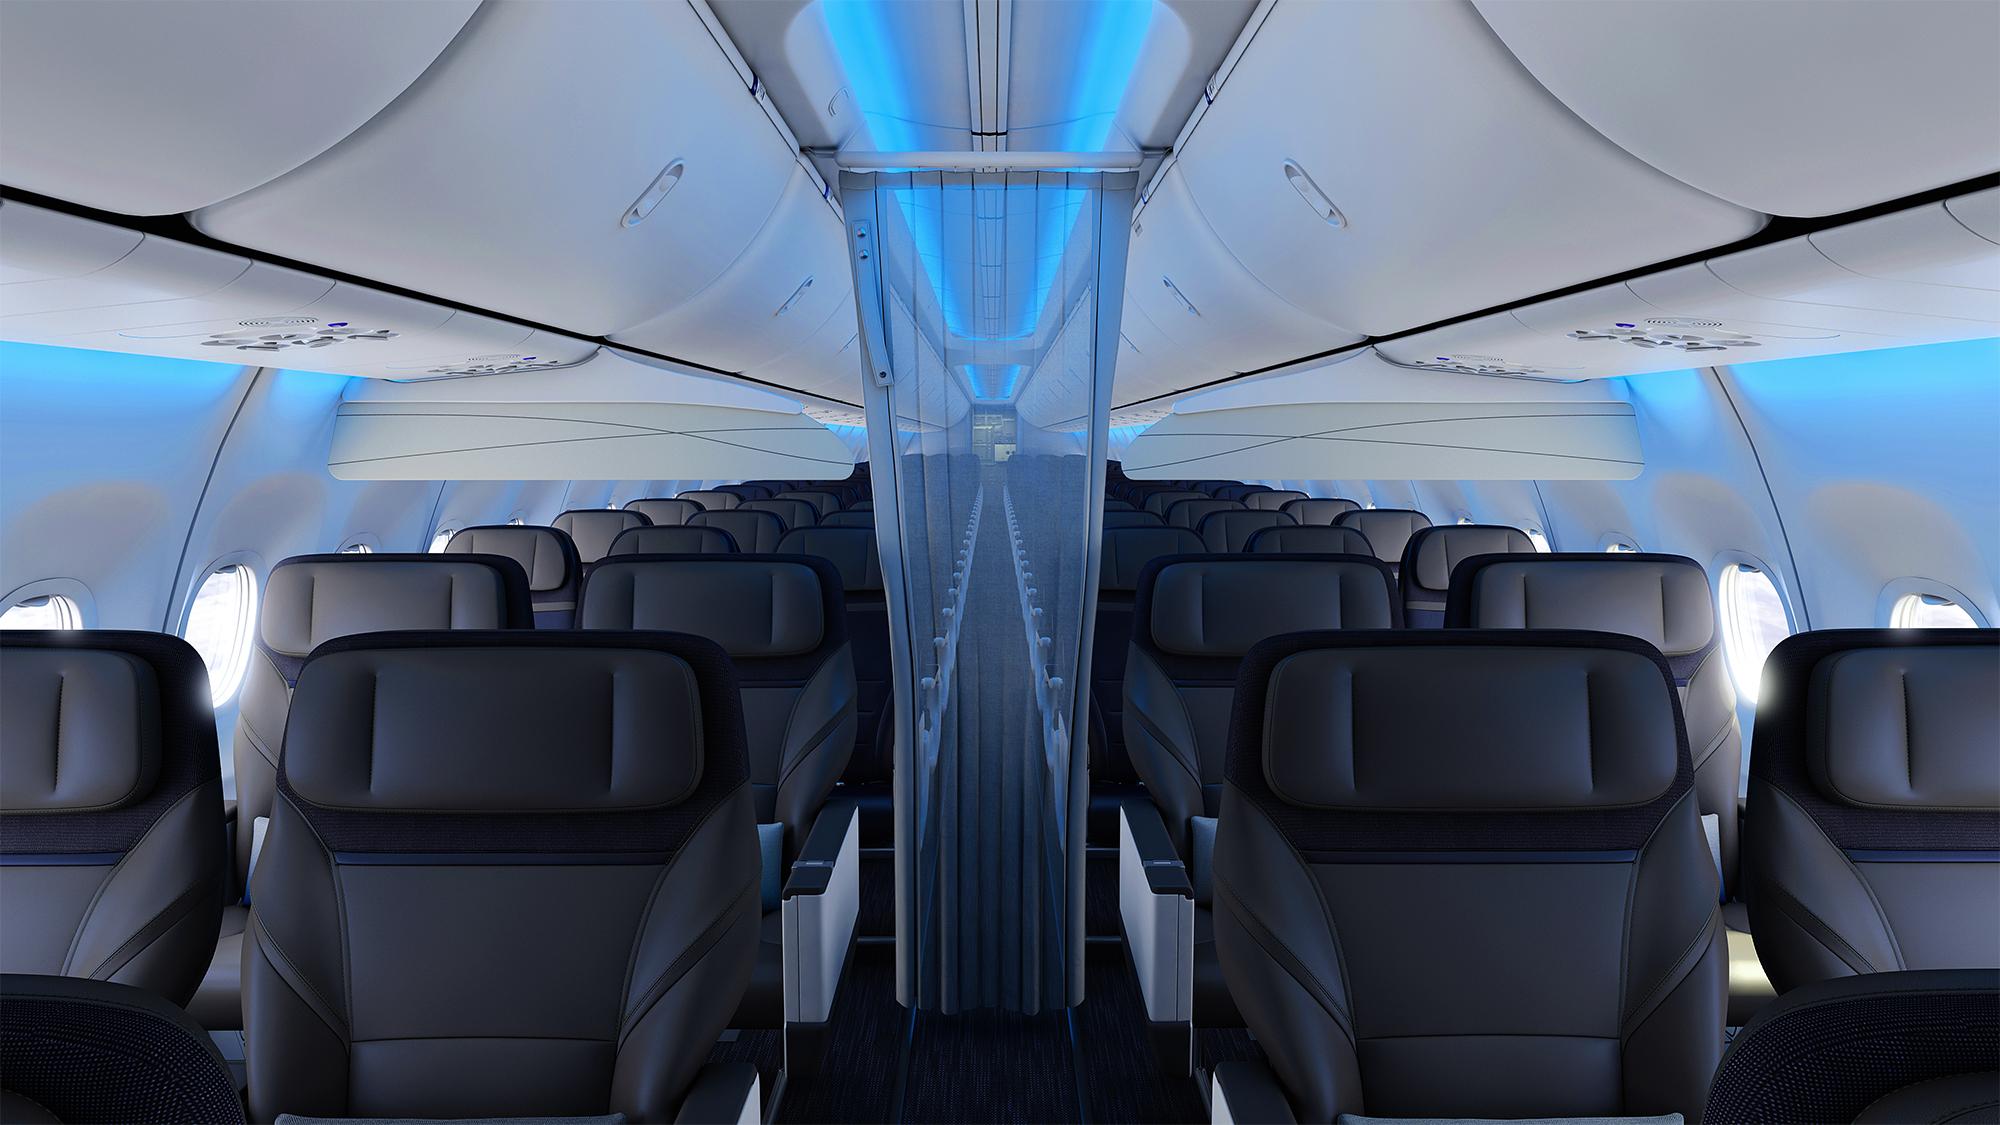 It S Official Alaska Airlines Won T Keep Virgin America